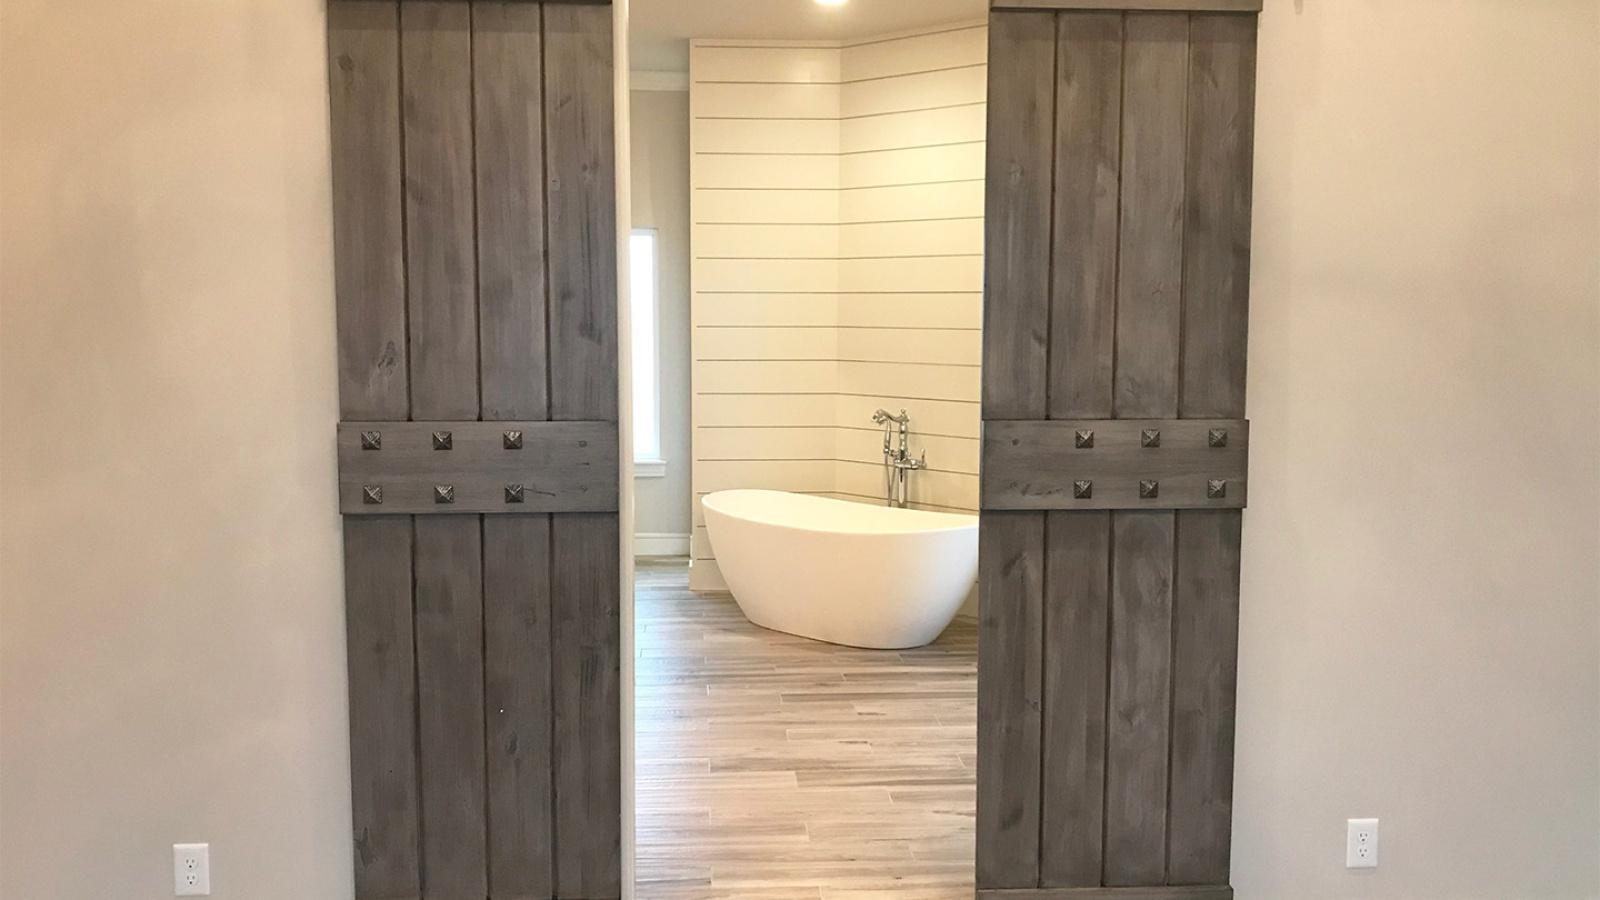 3 Bedrooms Bedrooms, ,4 BathroomsBathrooms,Custom Home,Home Plans,1056